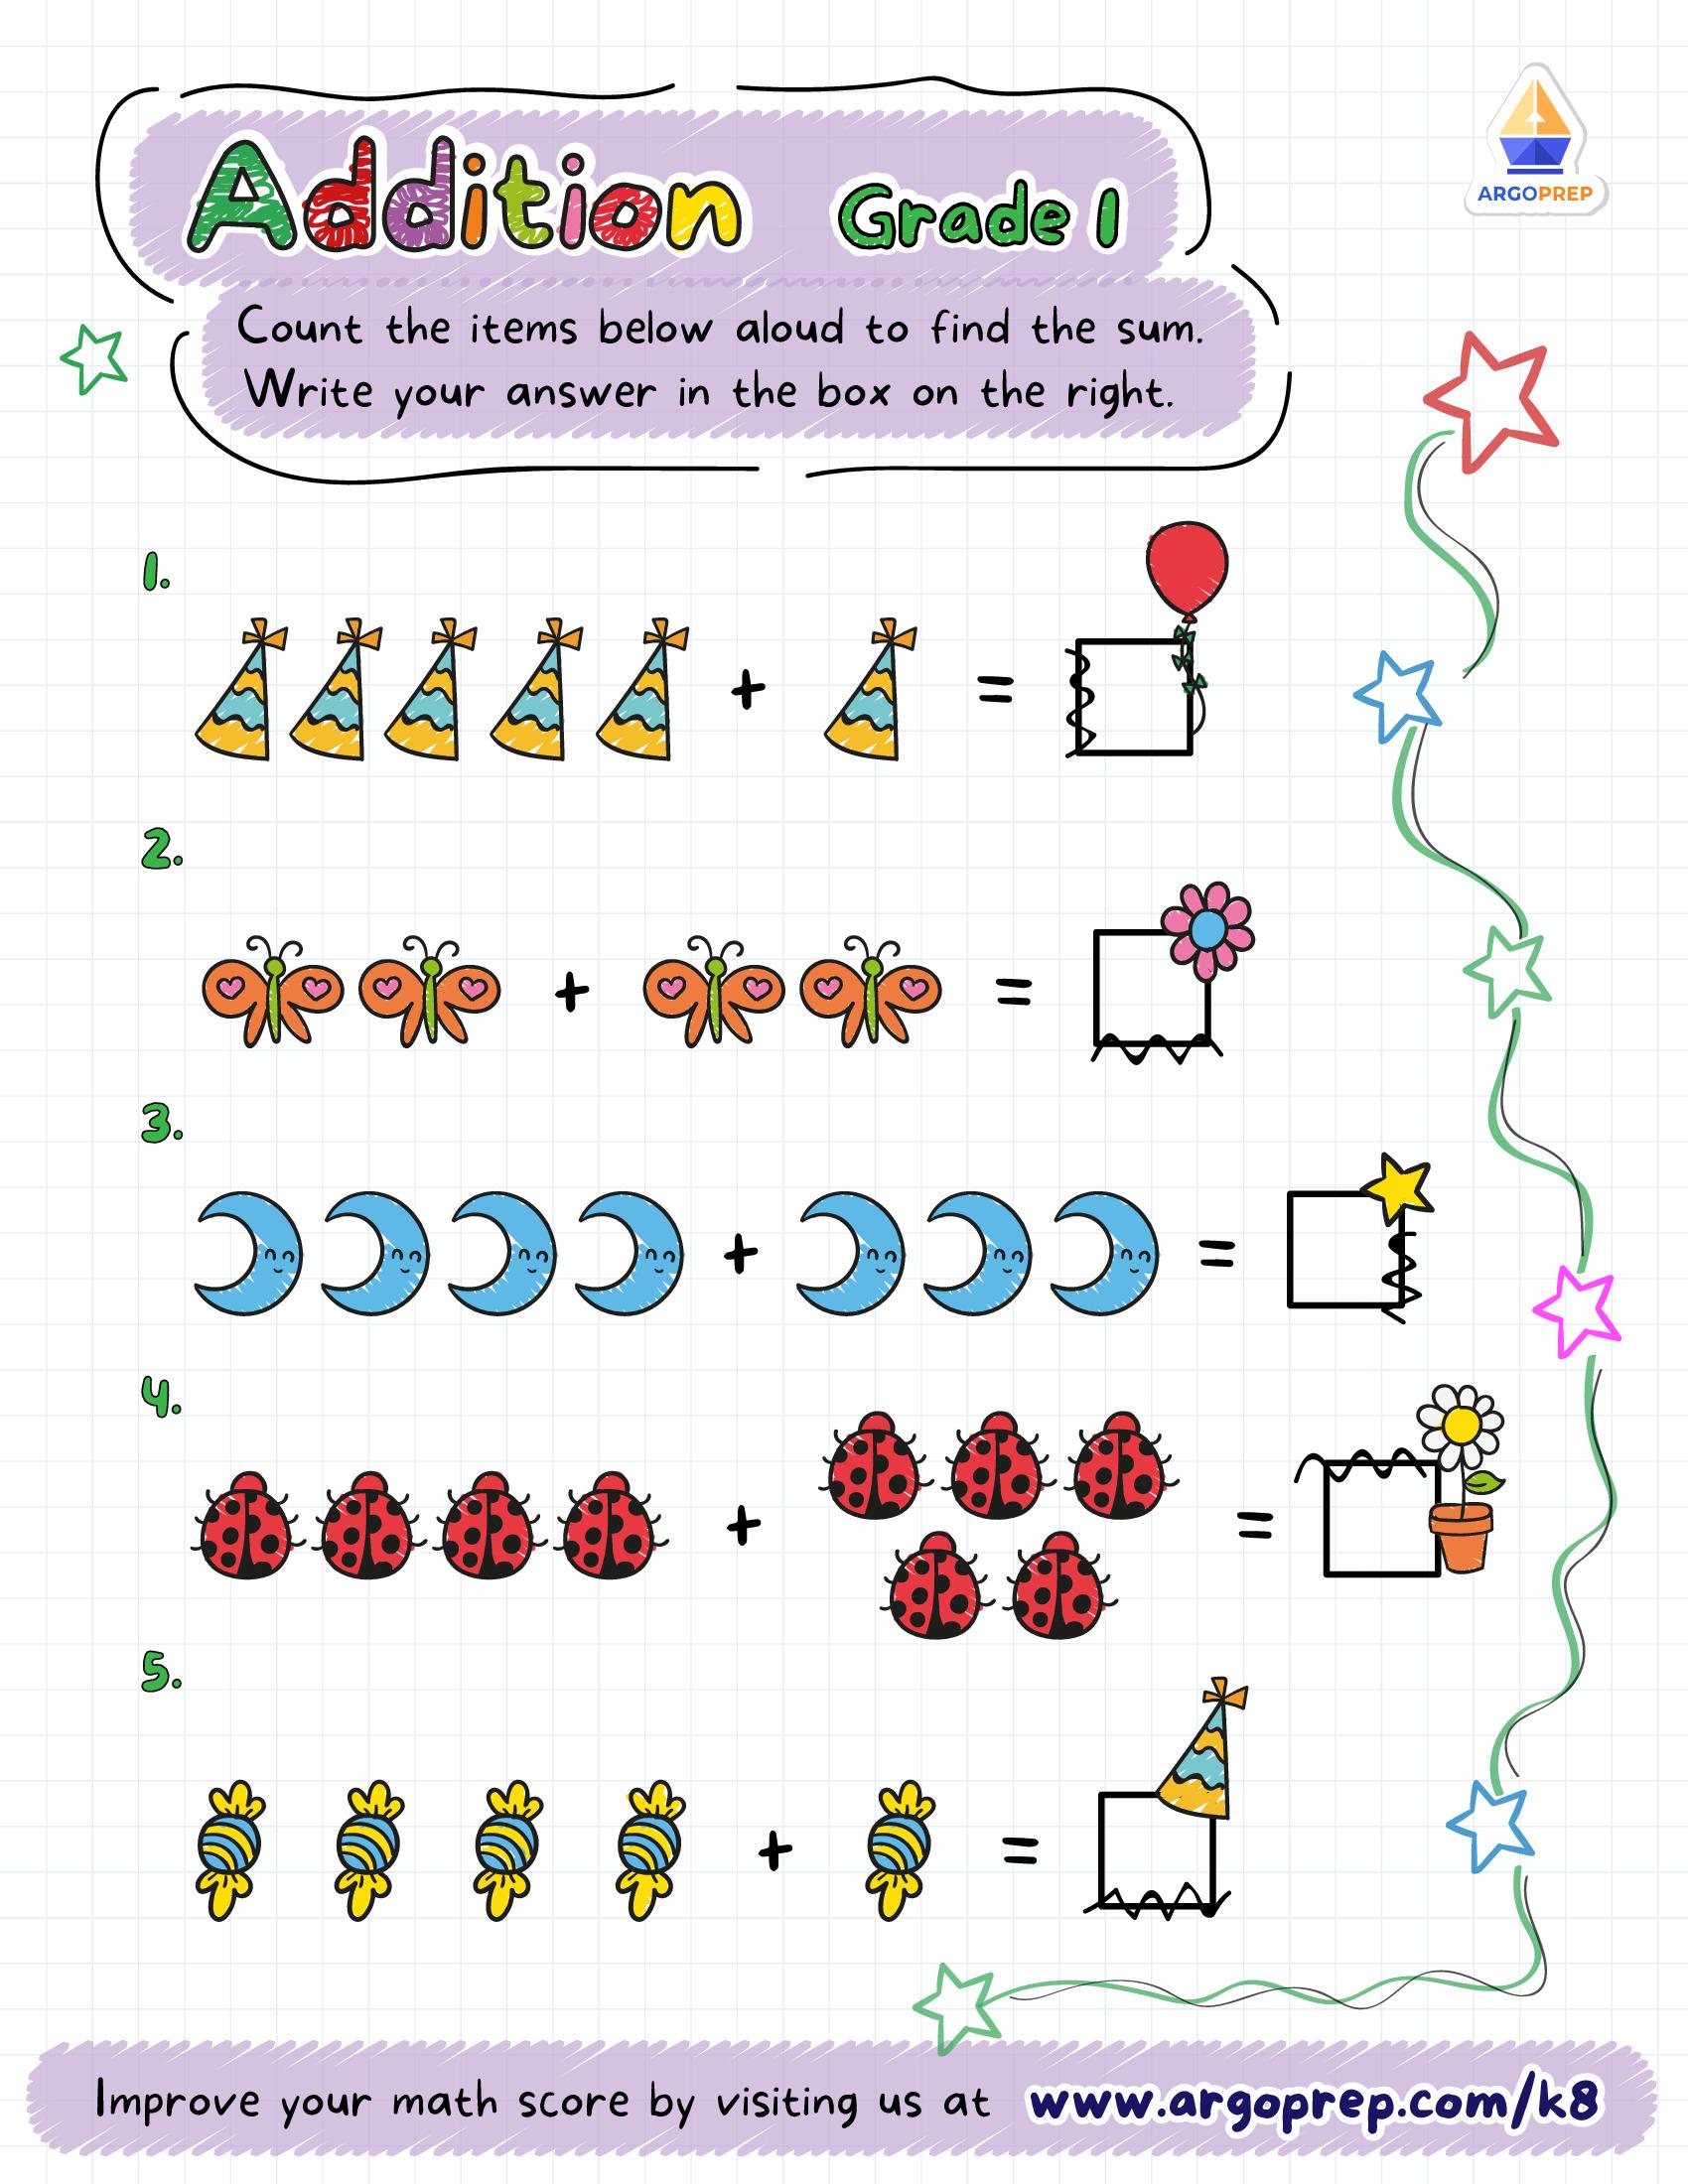 hight resolution of 7th Grade Math: Online Practice - ArgoPrep